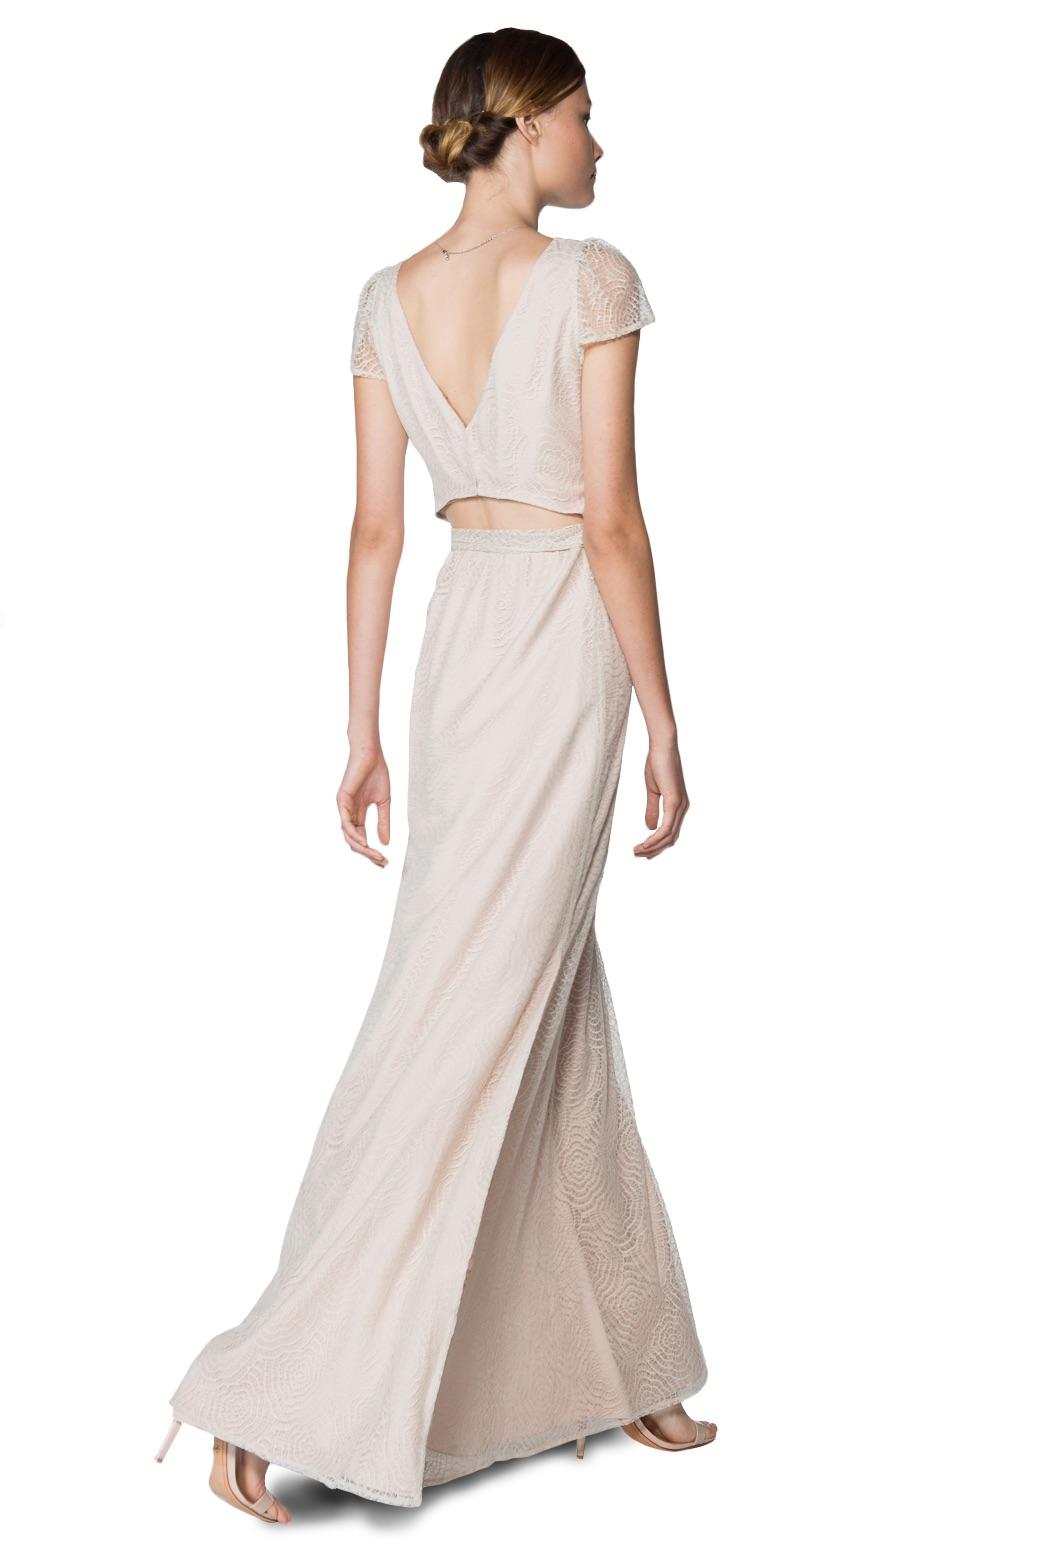 ivory-and-beau-bridal-boutique-savannah-wedding-dress-savannah-wedding-gown-savannah-bridal-boutique-savannah-bridal-shop-savannah-wedding-planner-rodan-and-fields-joanna-august-bridesmaids-kimberly-long-lace.jpg